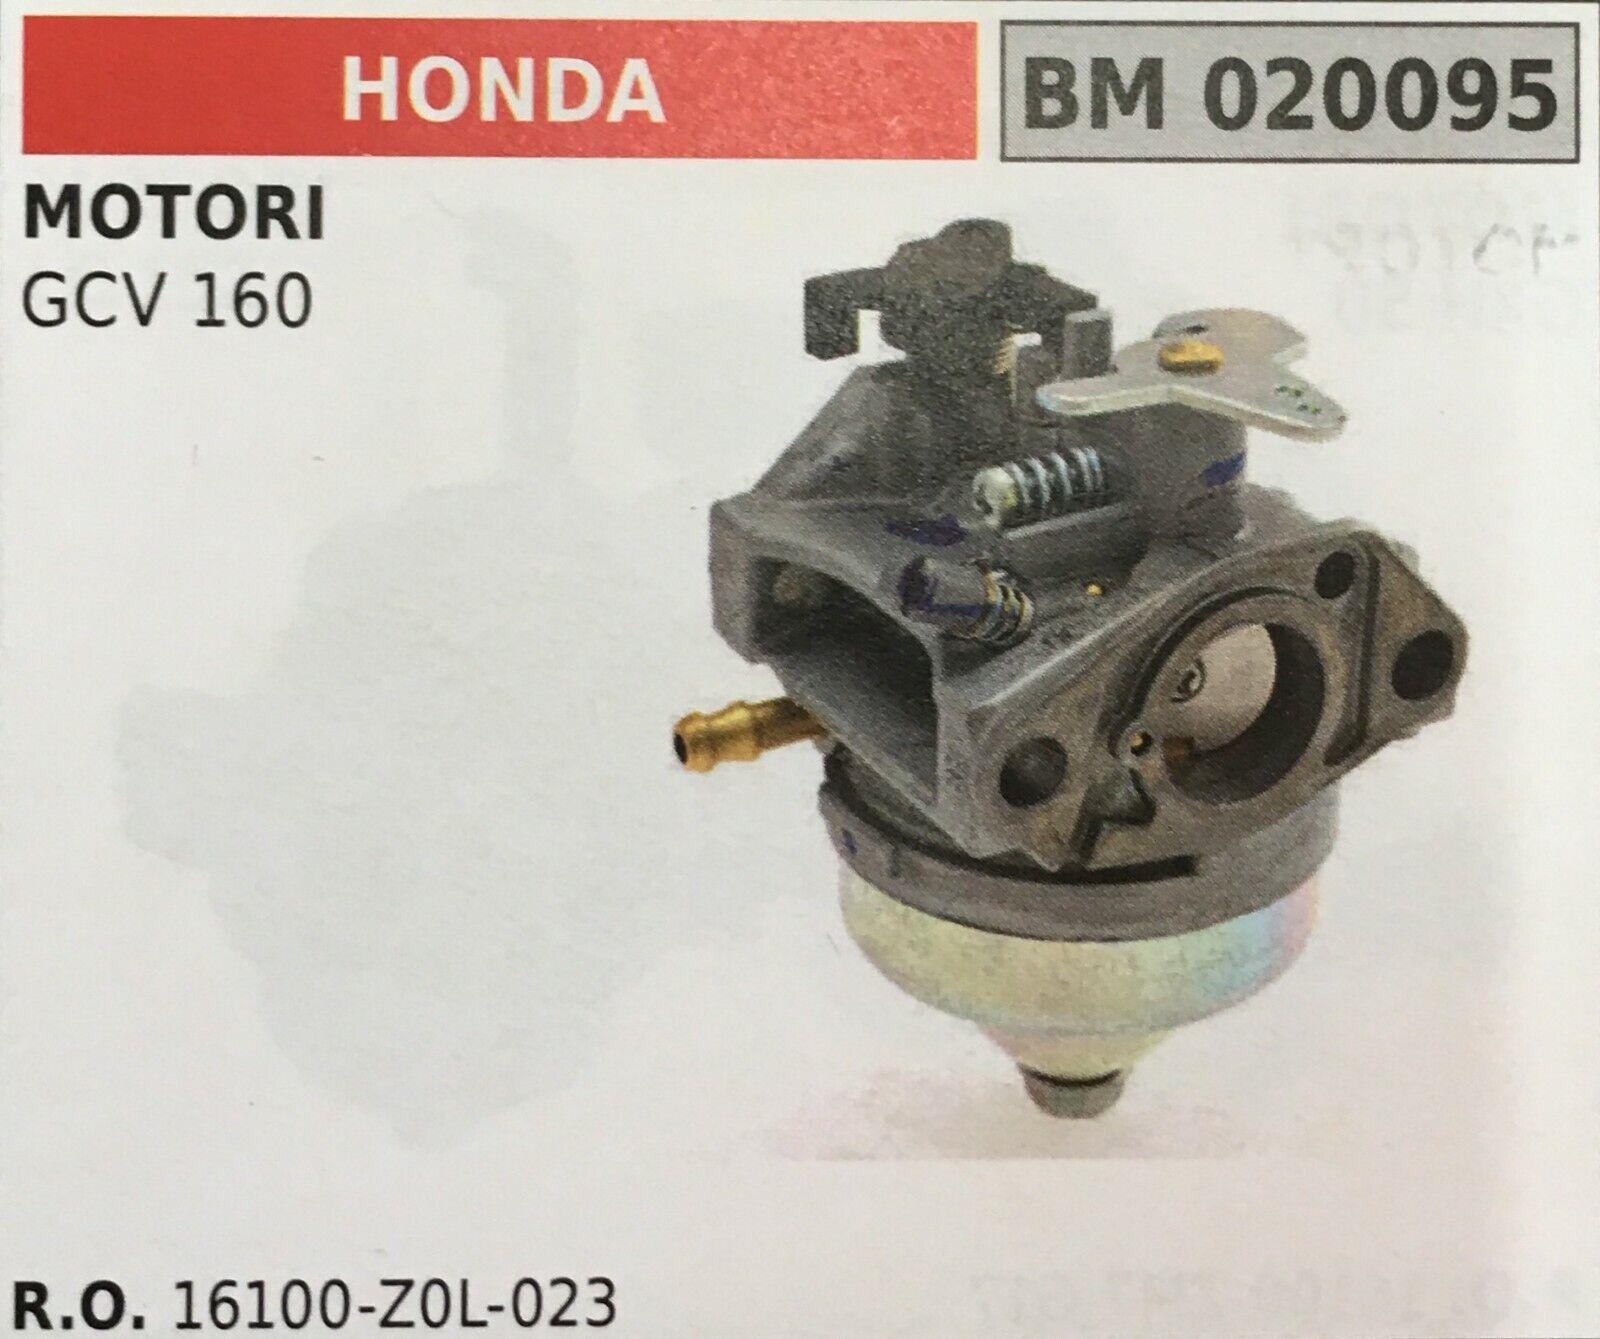 Vergaser A Ölwanne Brumar Honda BM020095 Motoren Gcv 160